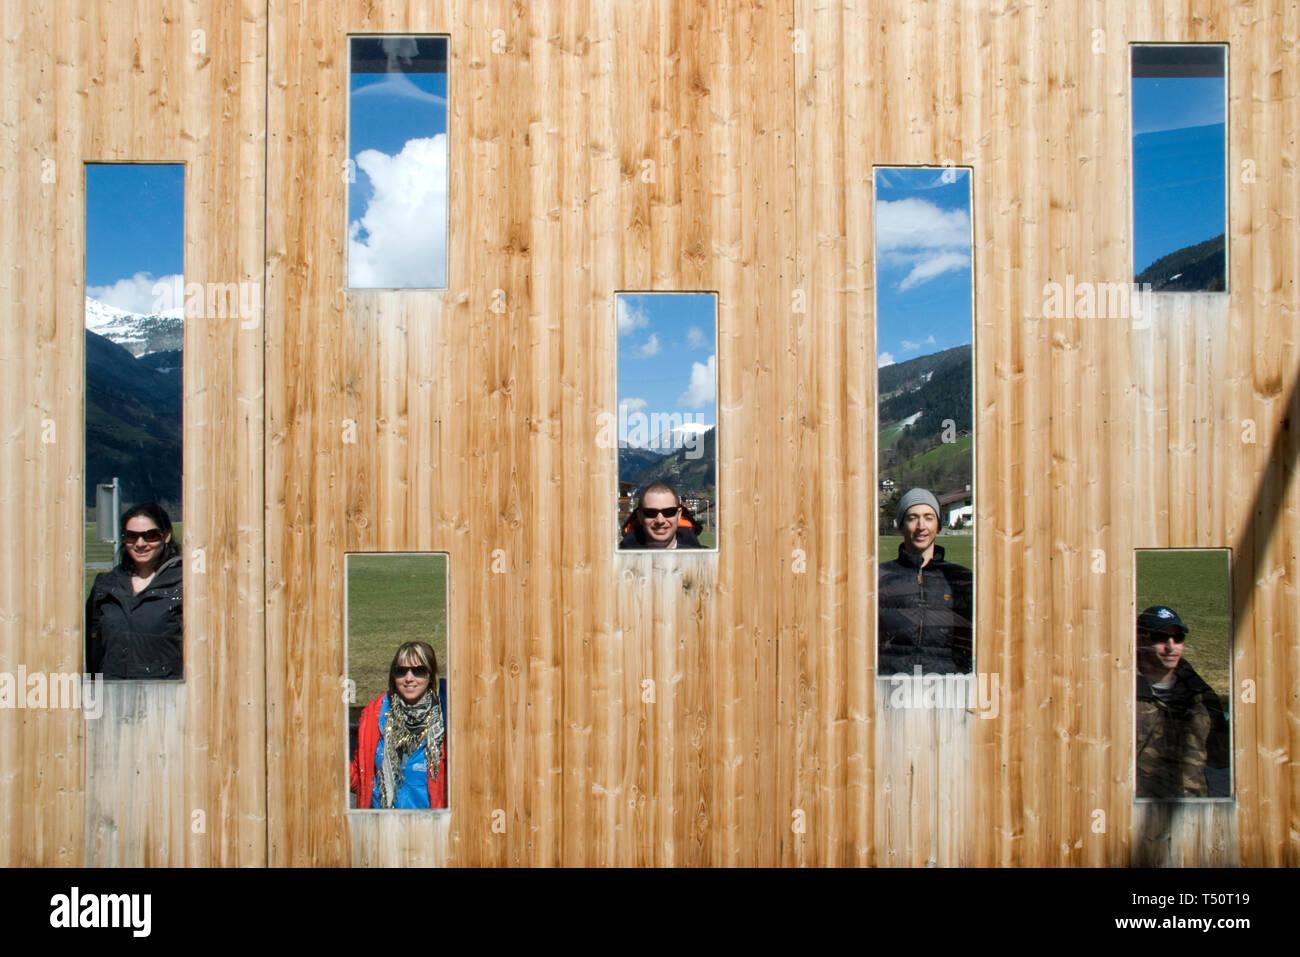 Fun with friend at ErlebnisSennerei Zillertal cheese farm in Mayrhofen, Austria - Stock Image